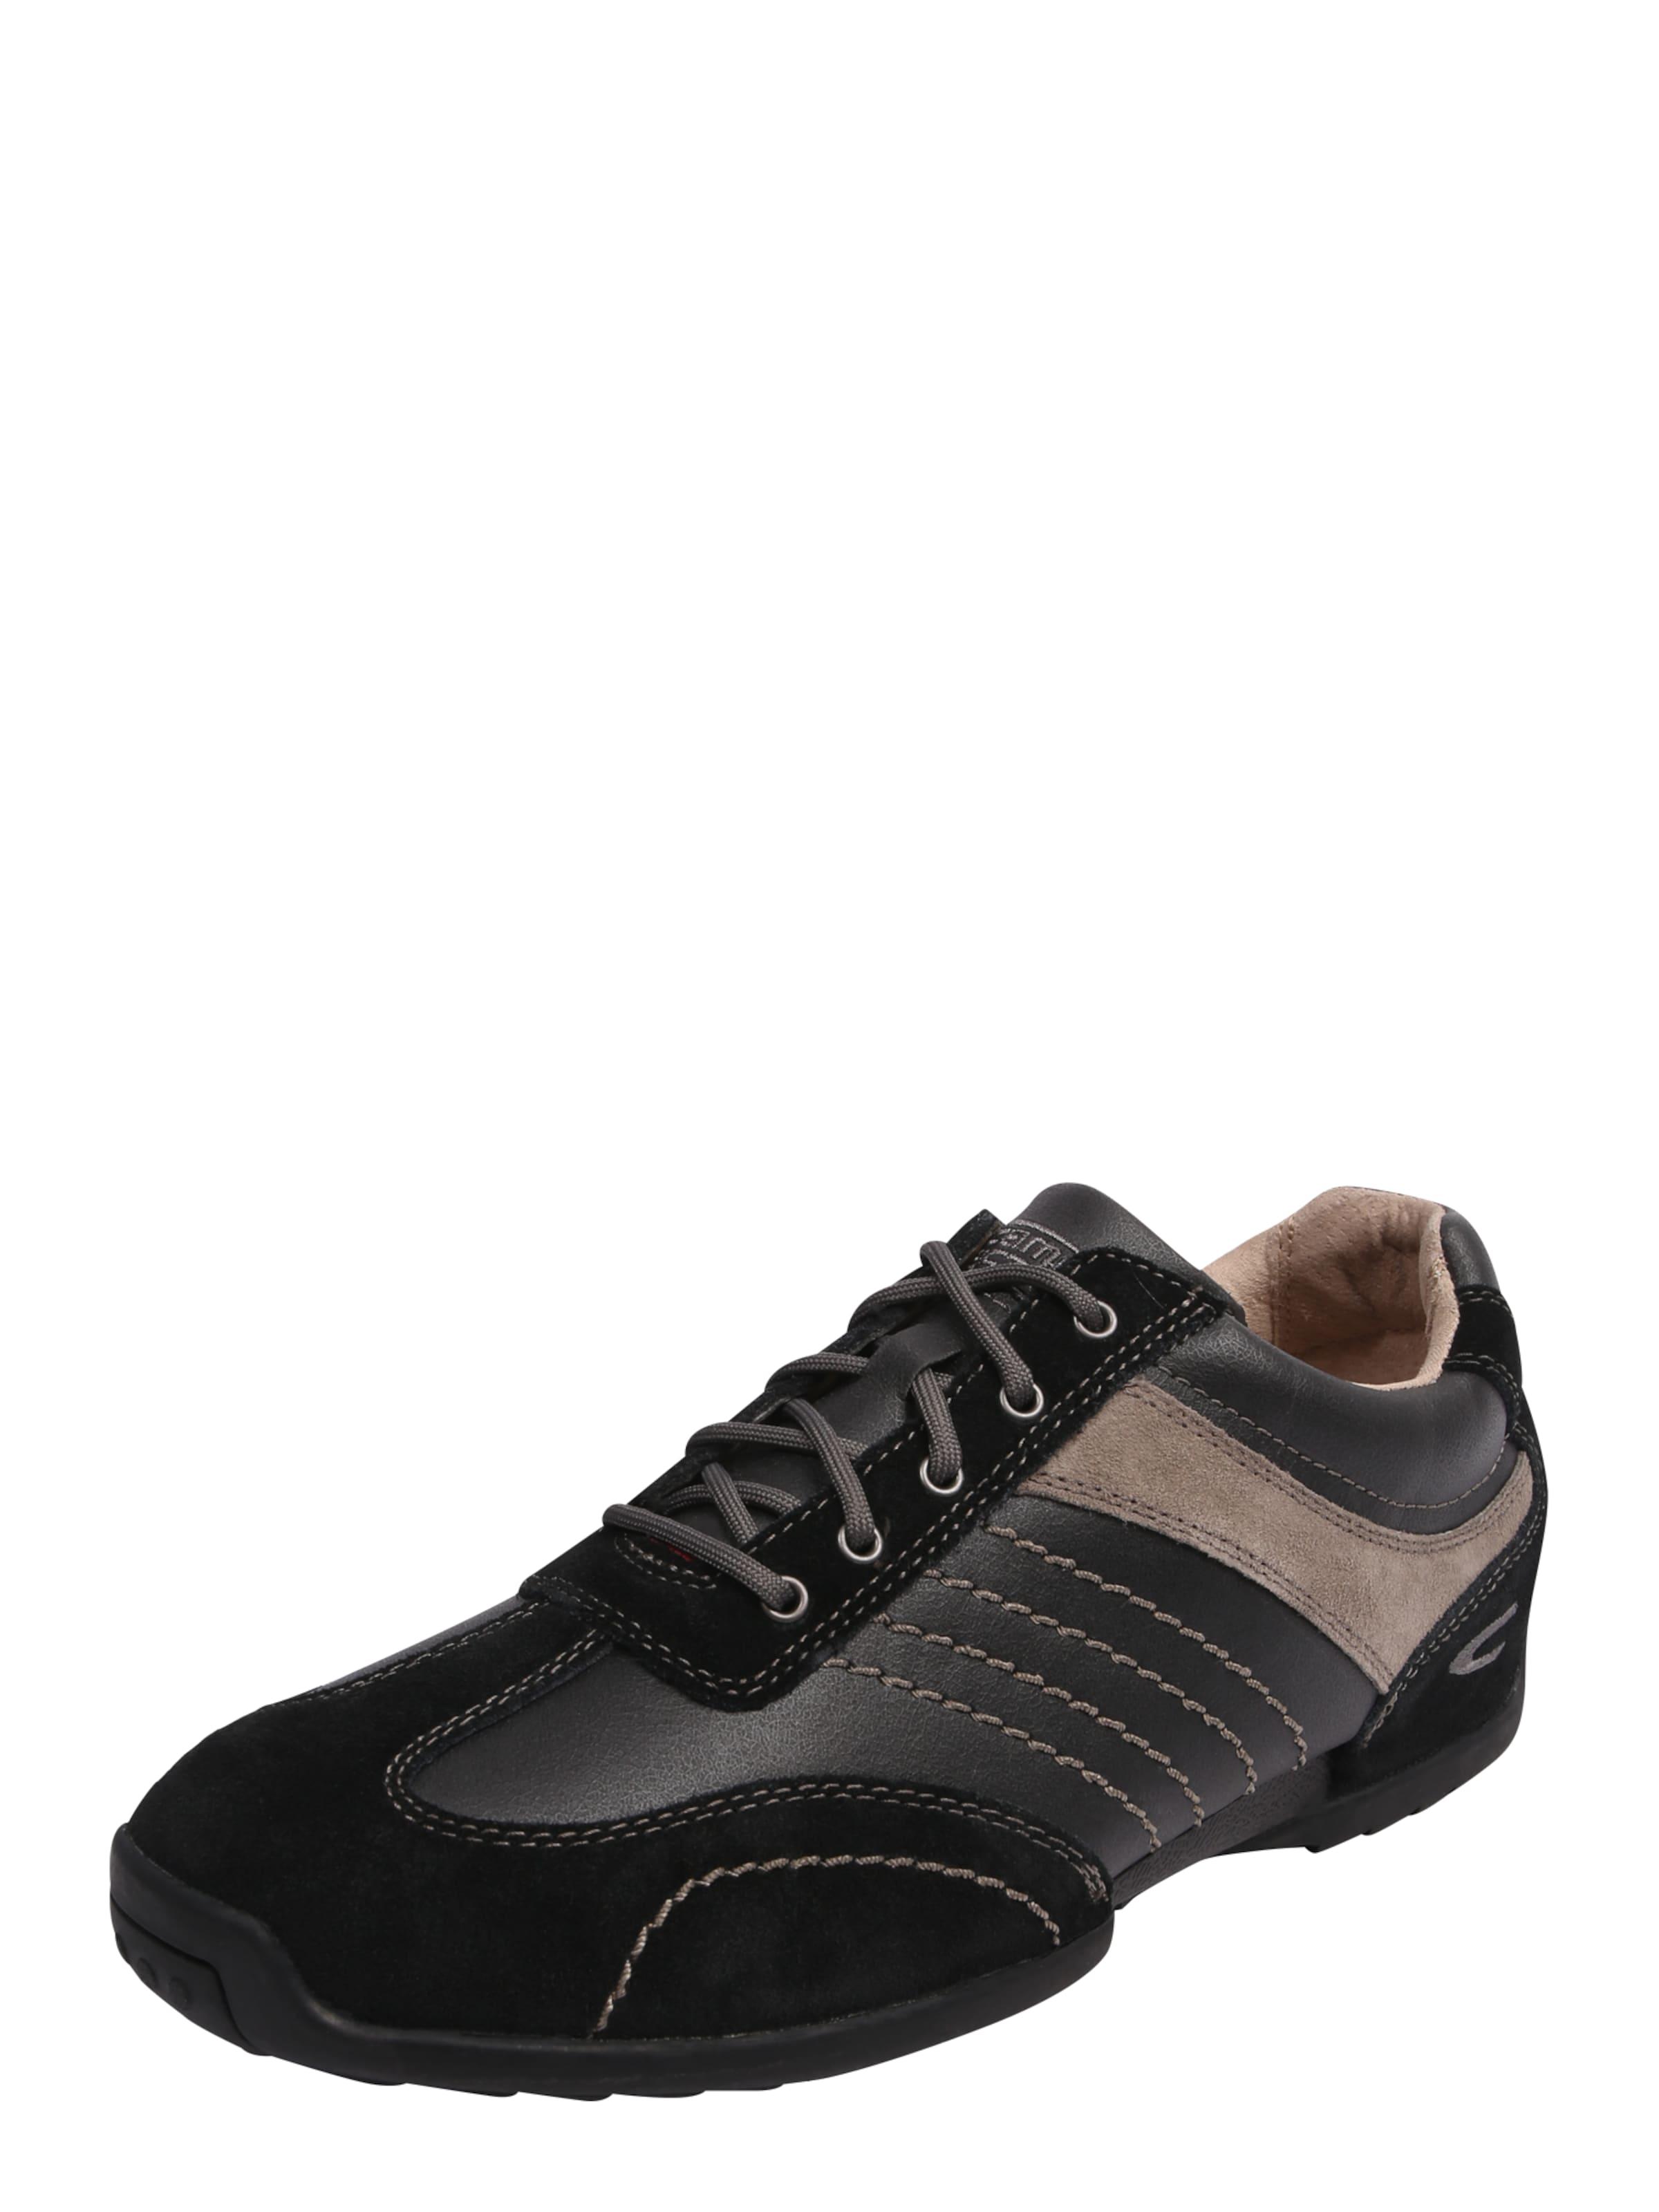 CAMEL ACTIVE Sneaker  Space 12